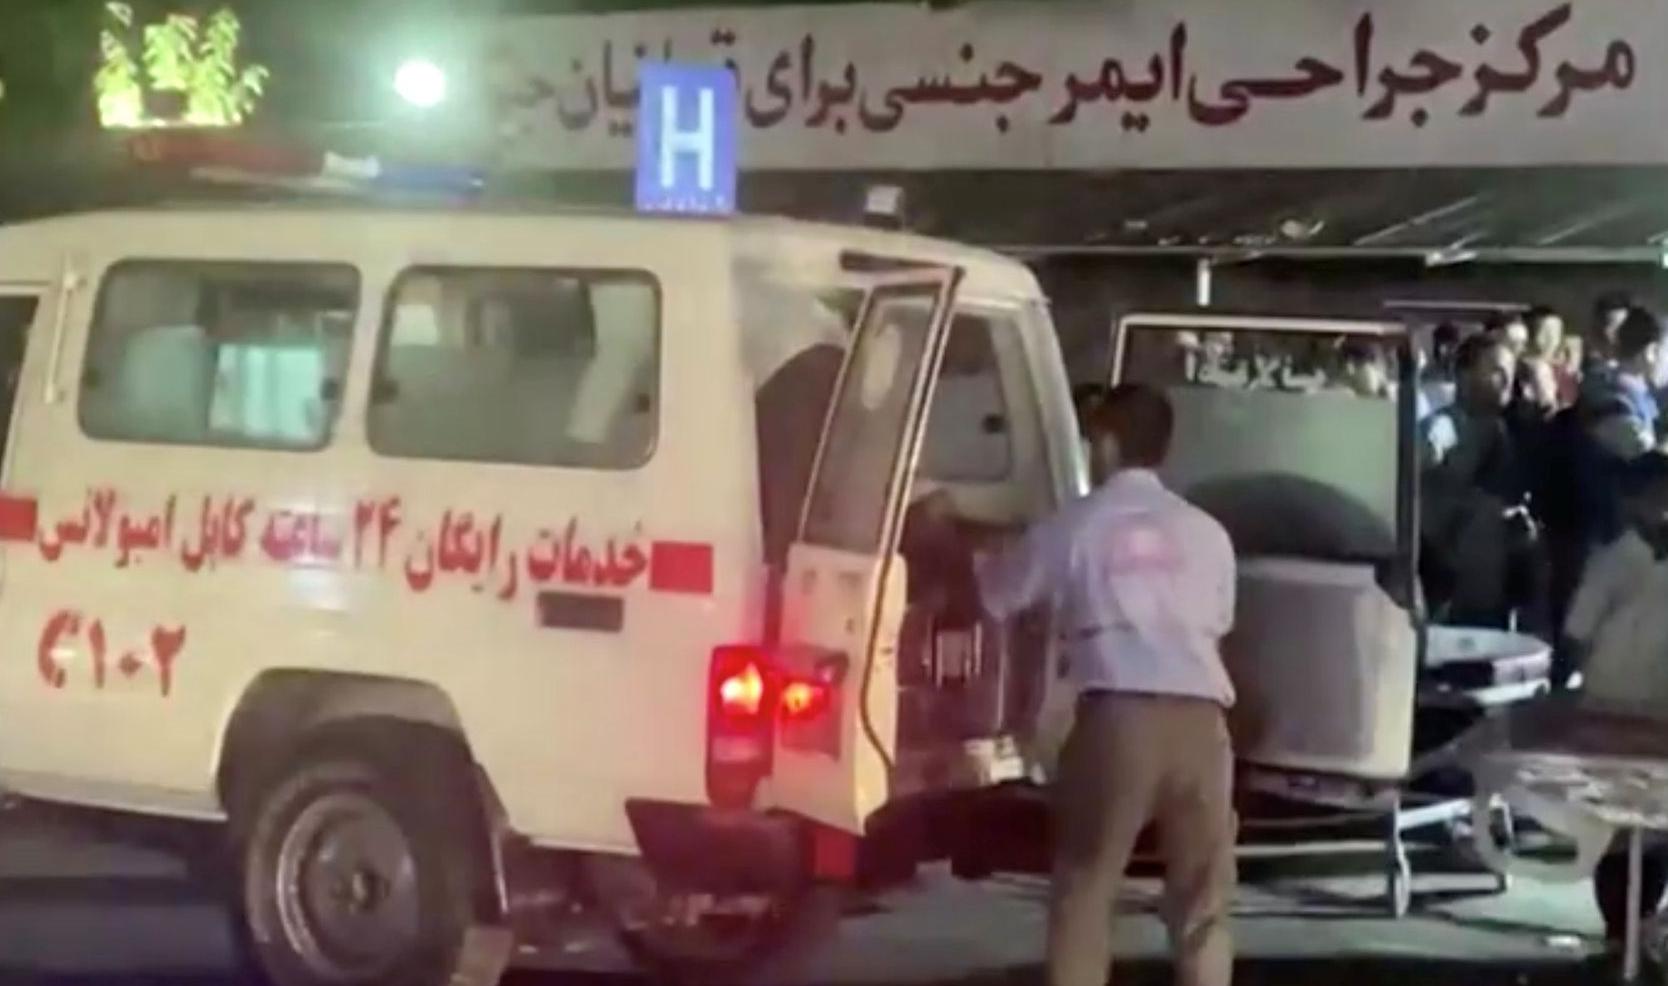 Afghanistan Crisis: পঞ্জশির দখলের দাবি করে উল্লাসে এলোপাথাড়ি গুলি তালিবানের, কাবুলে নিহত কমপক্ষে ১৭